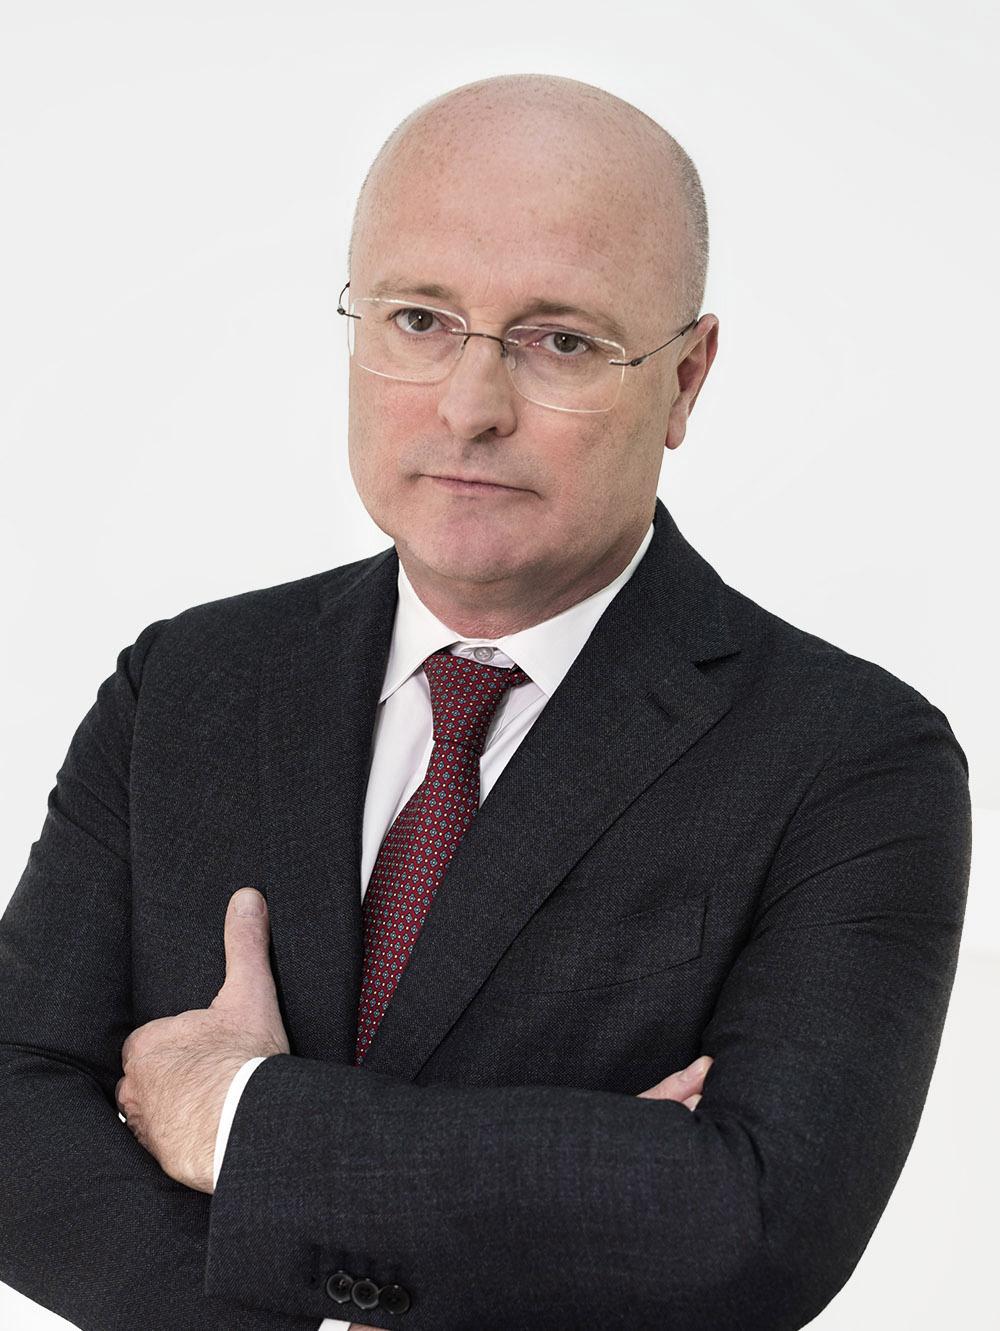 Giancarlo Fancel